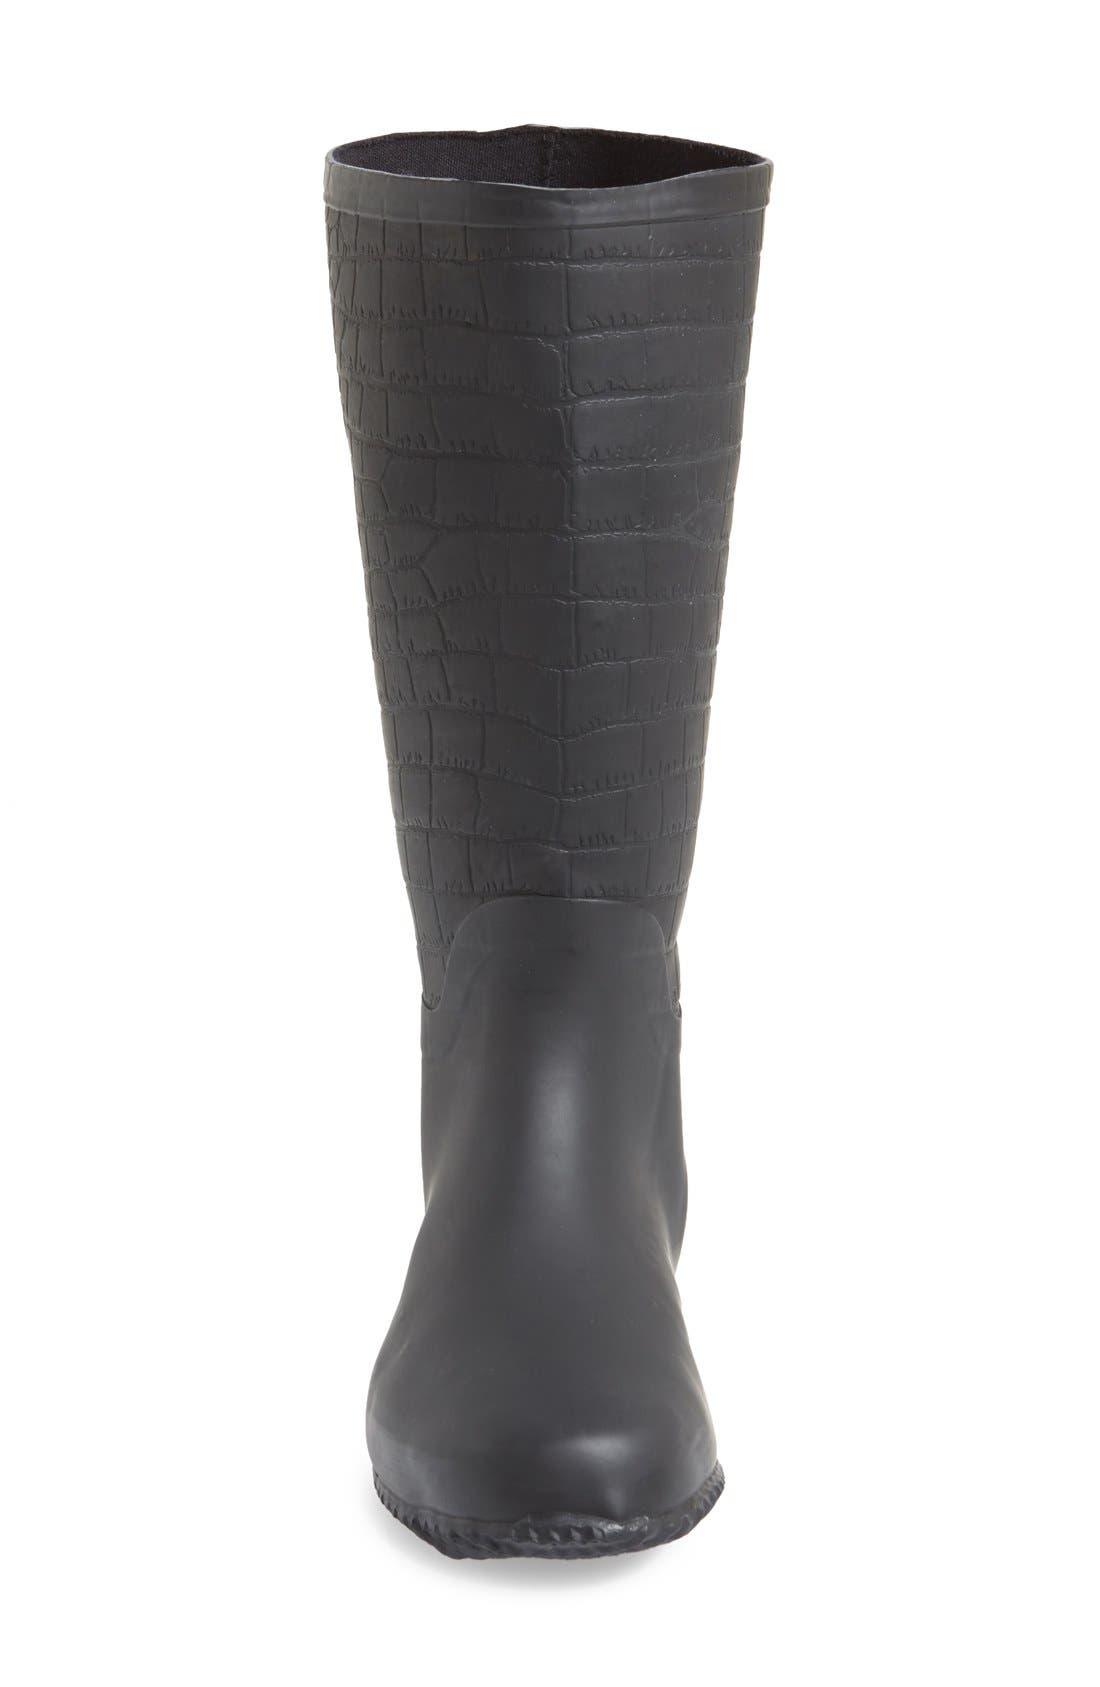 Alternate Image 3  - Butterfly Twists 'Carlisle' Foldable Rain Boot (Women)